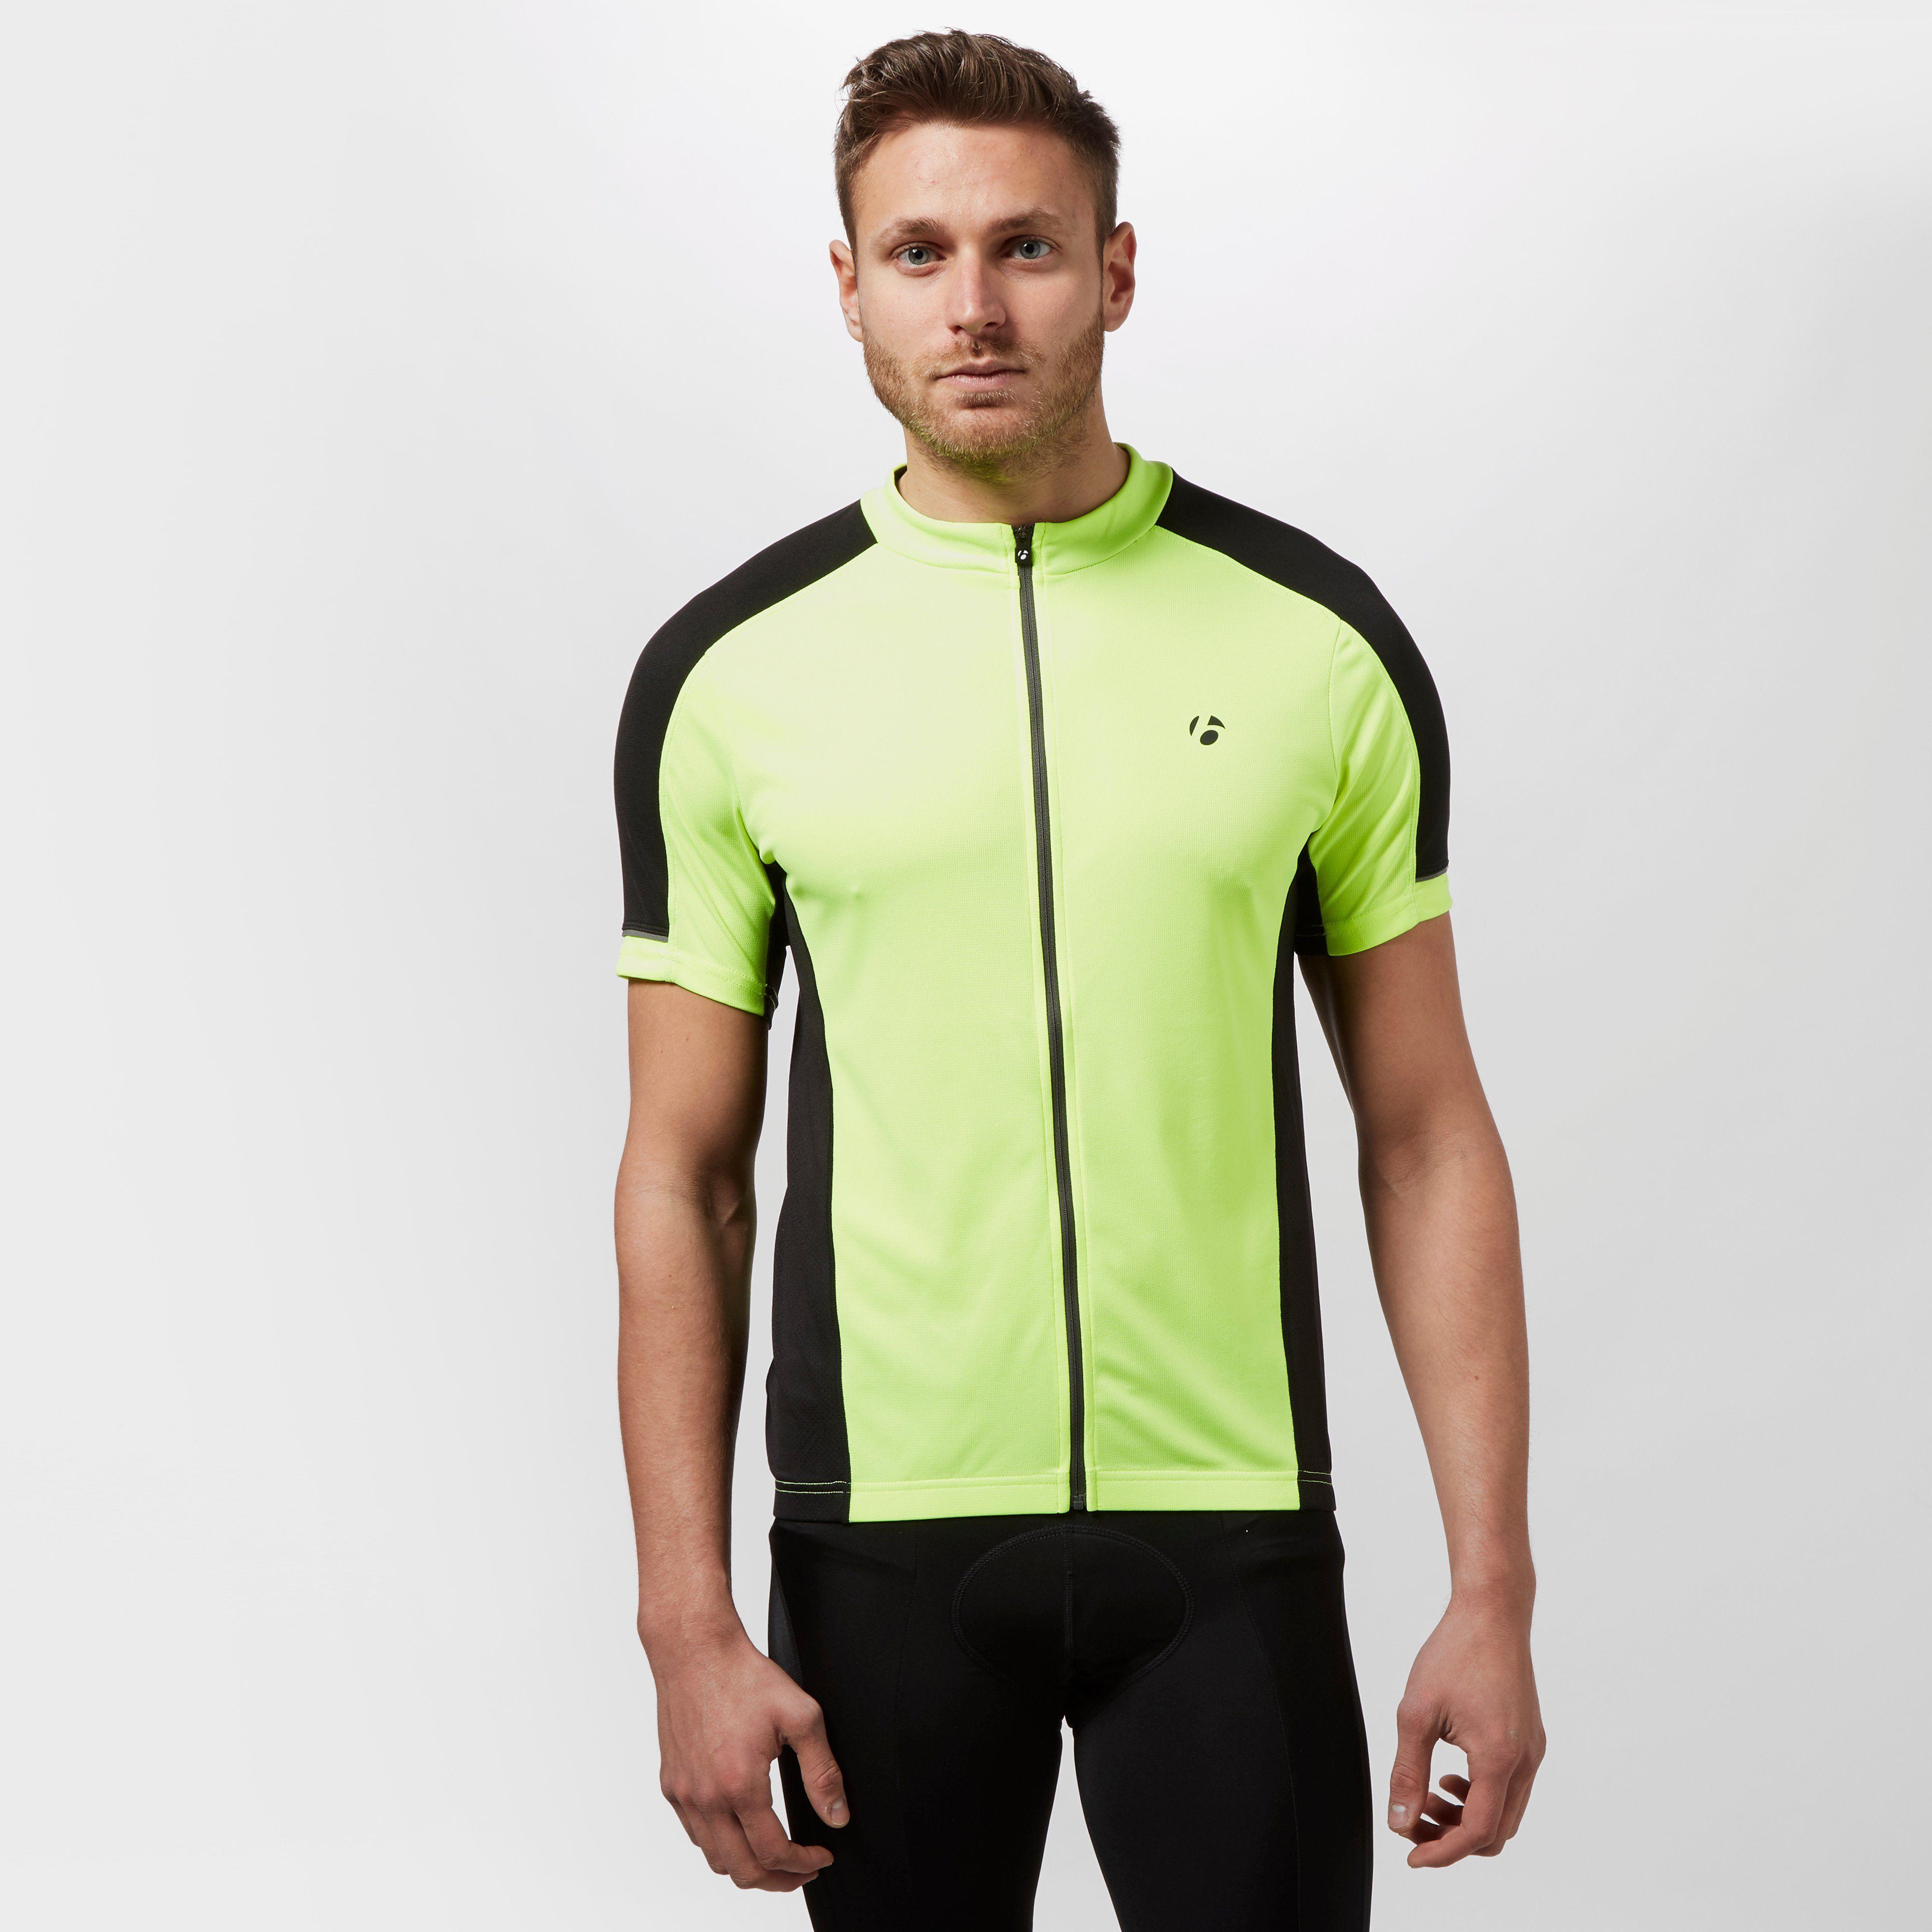 BONTRAGER Men's Starvos Cycling Jersey